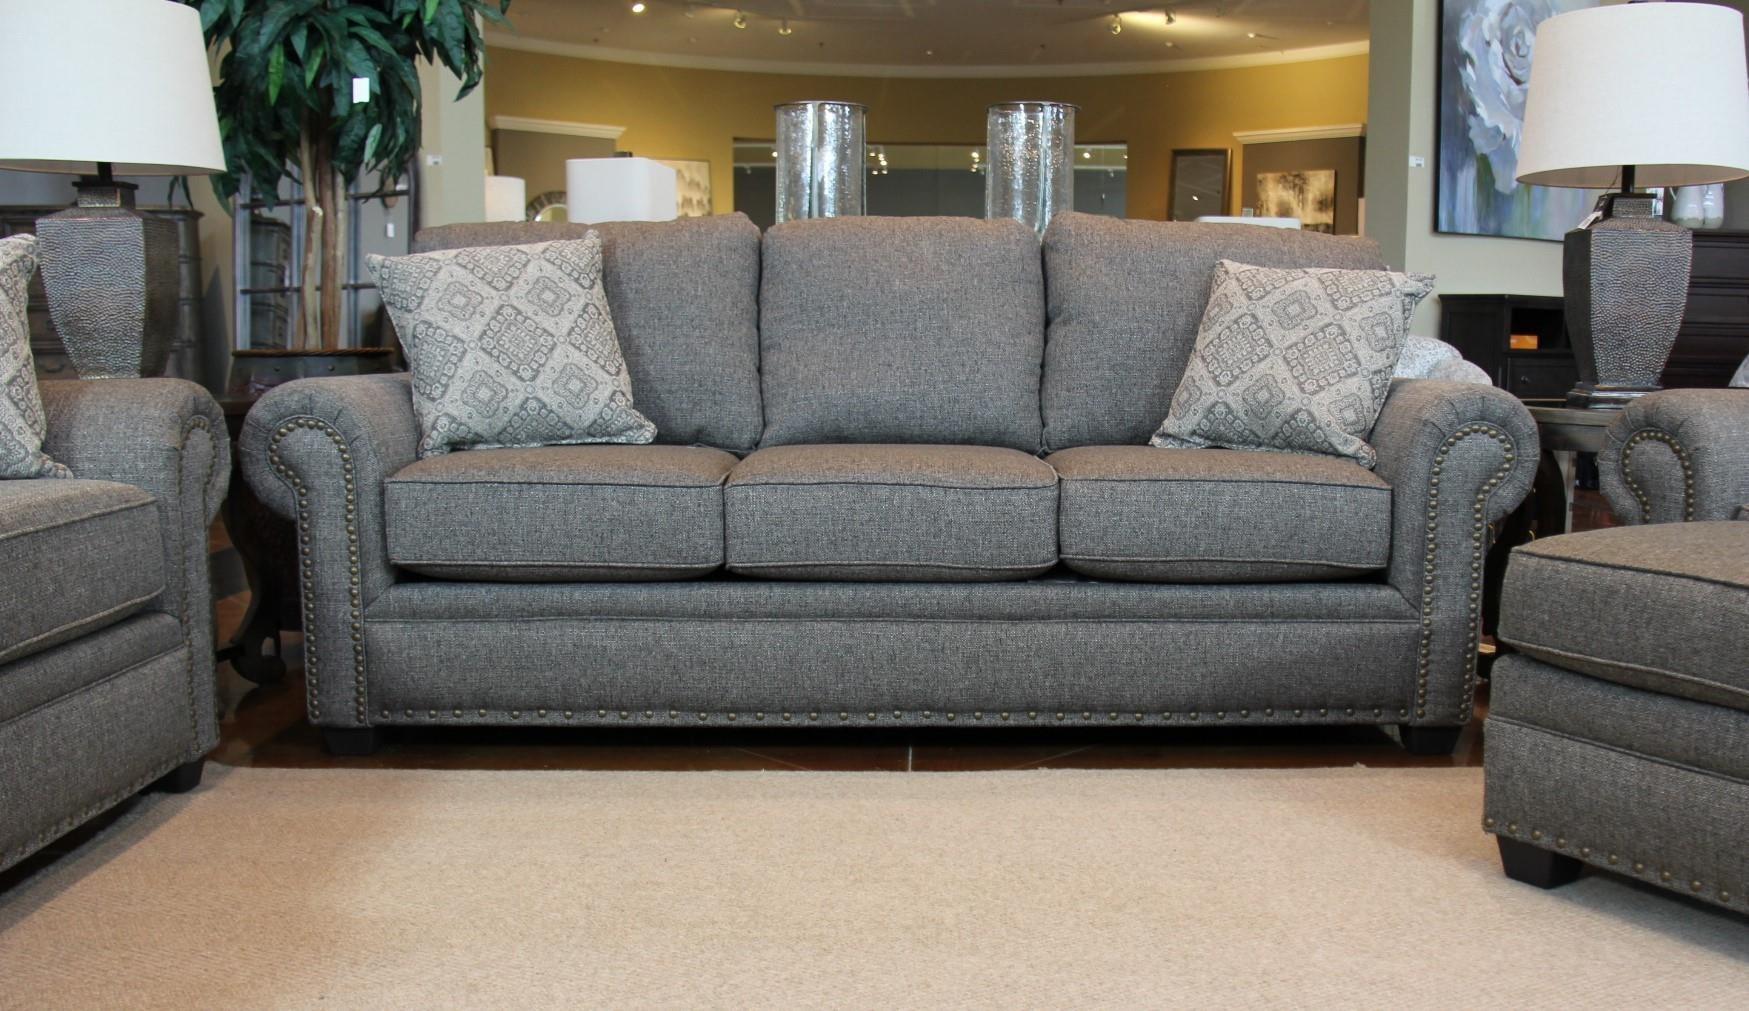 Sugarshack Otter Sofa